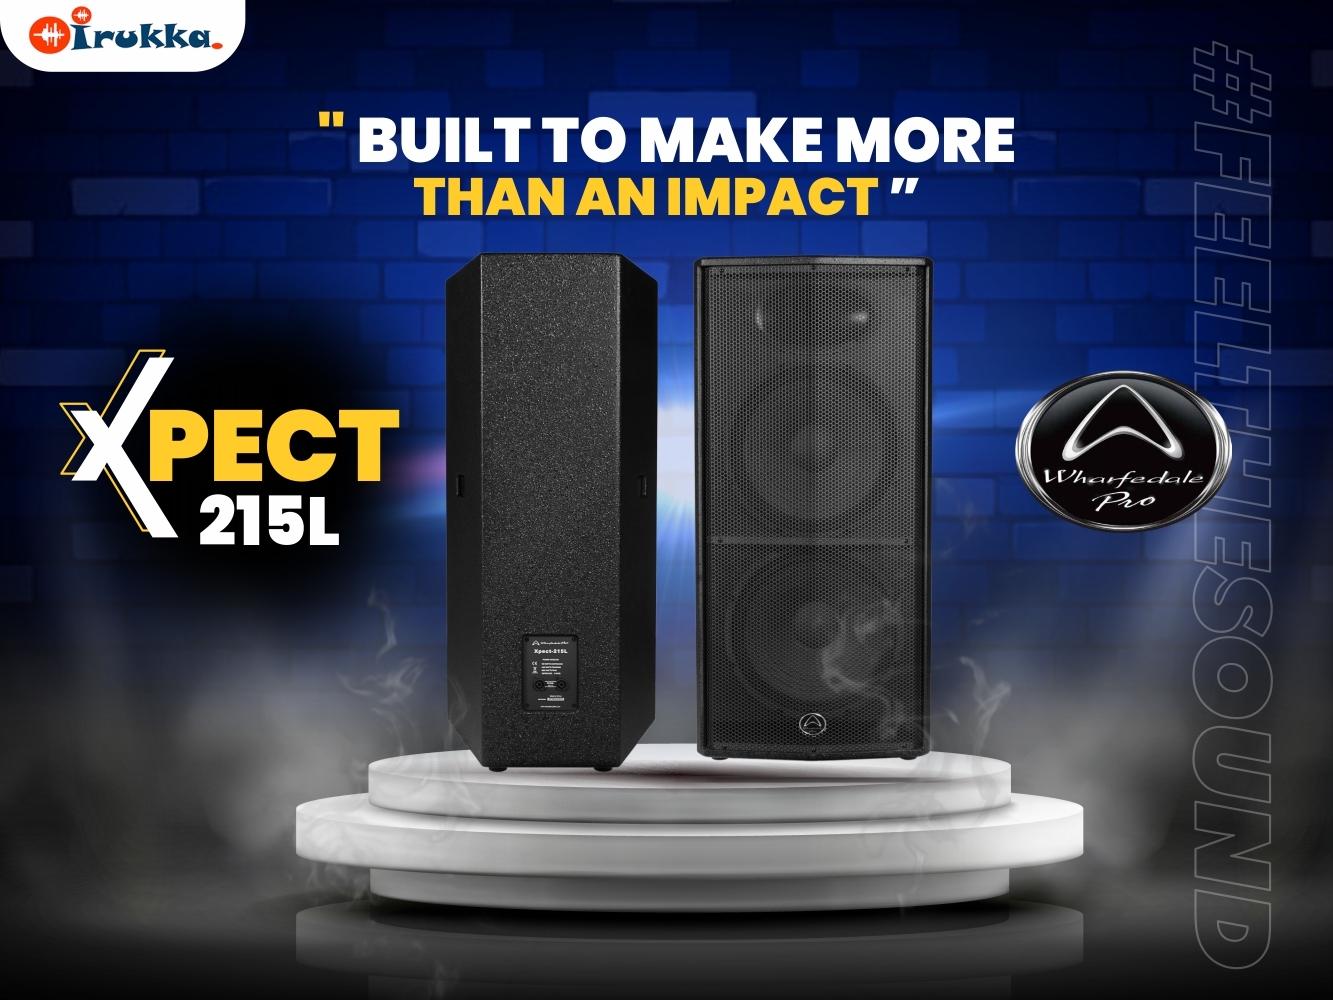 BUILT TO MAKE MORE THAN AN IMPACT - XPECT 215L PA LOUDSPEAKER